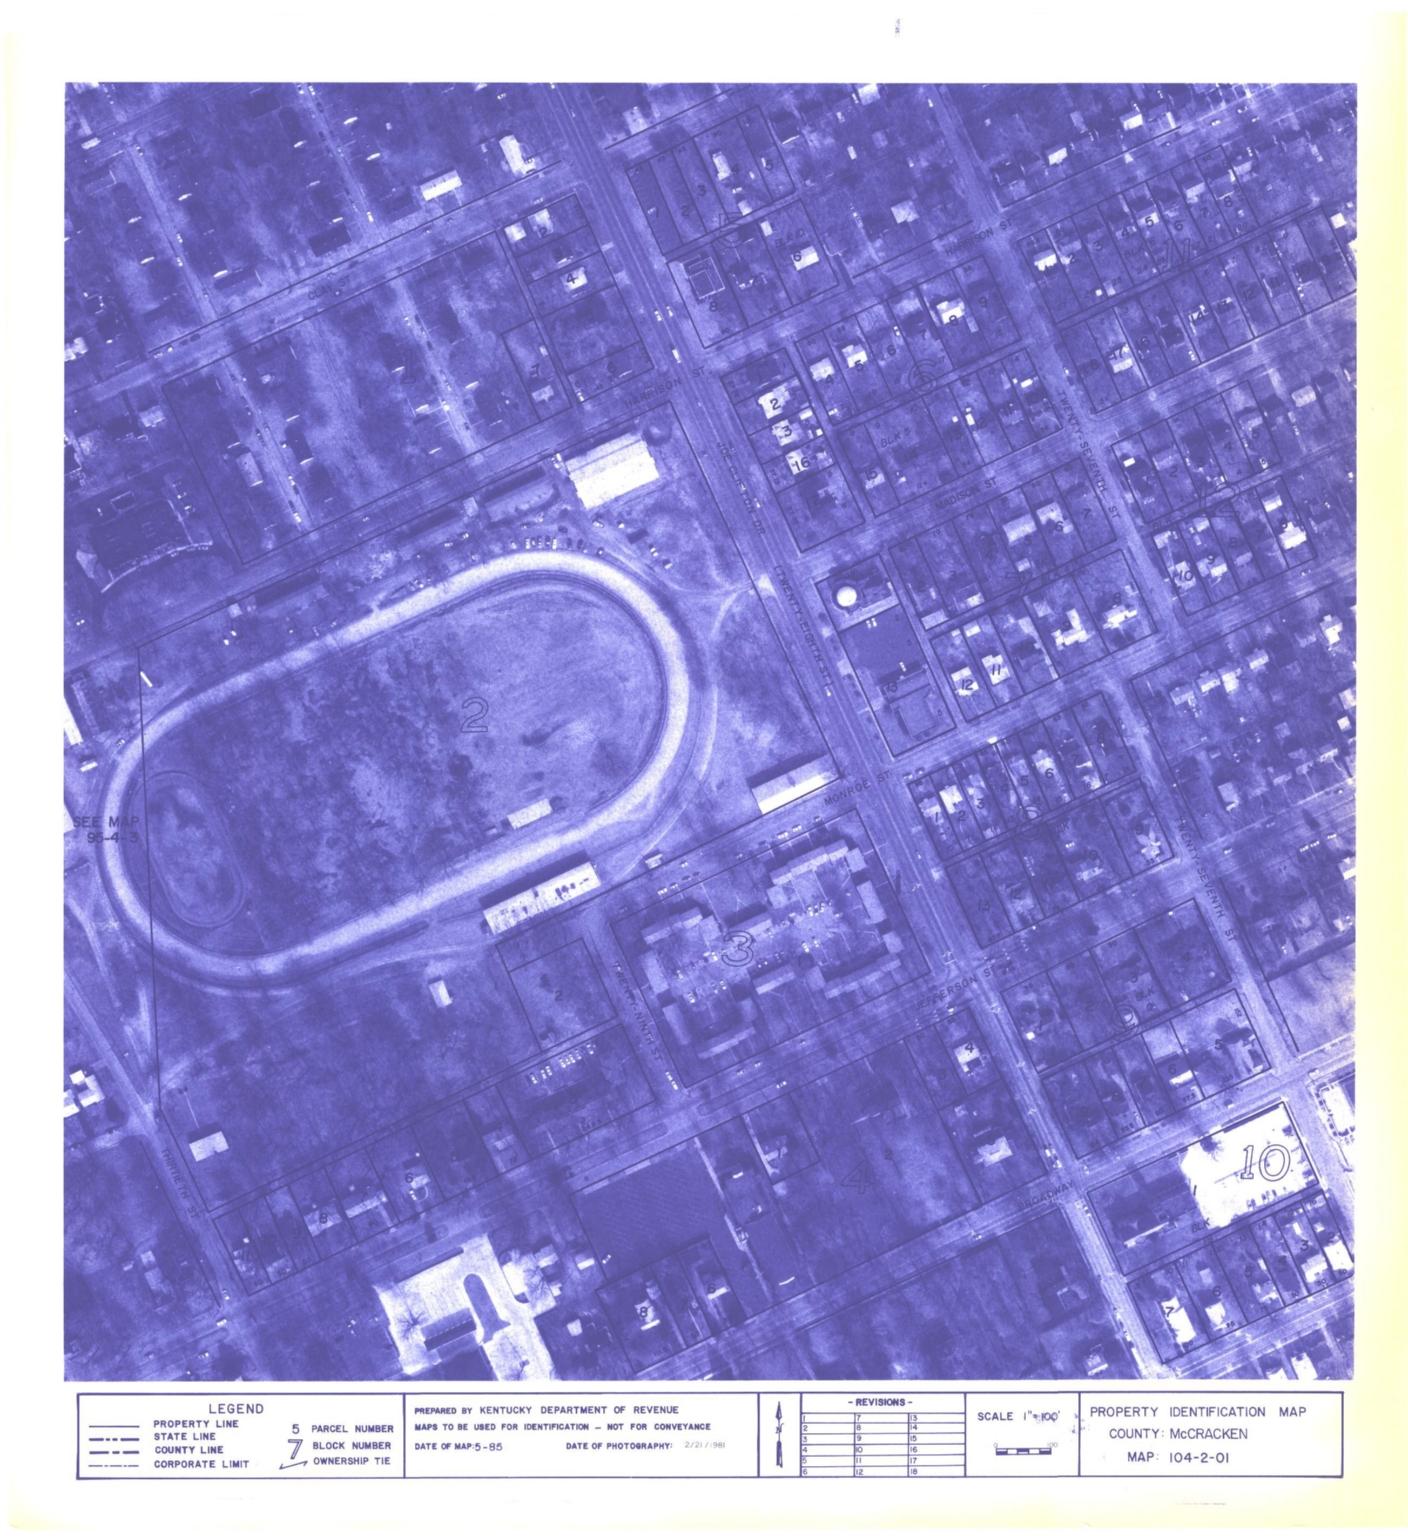 Property Identification Map McCracken County, Map 104-1-2-01